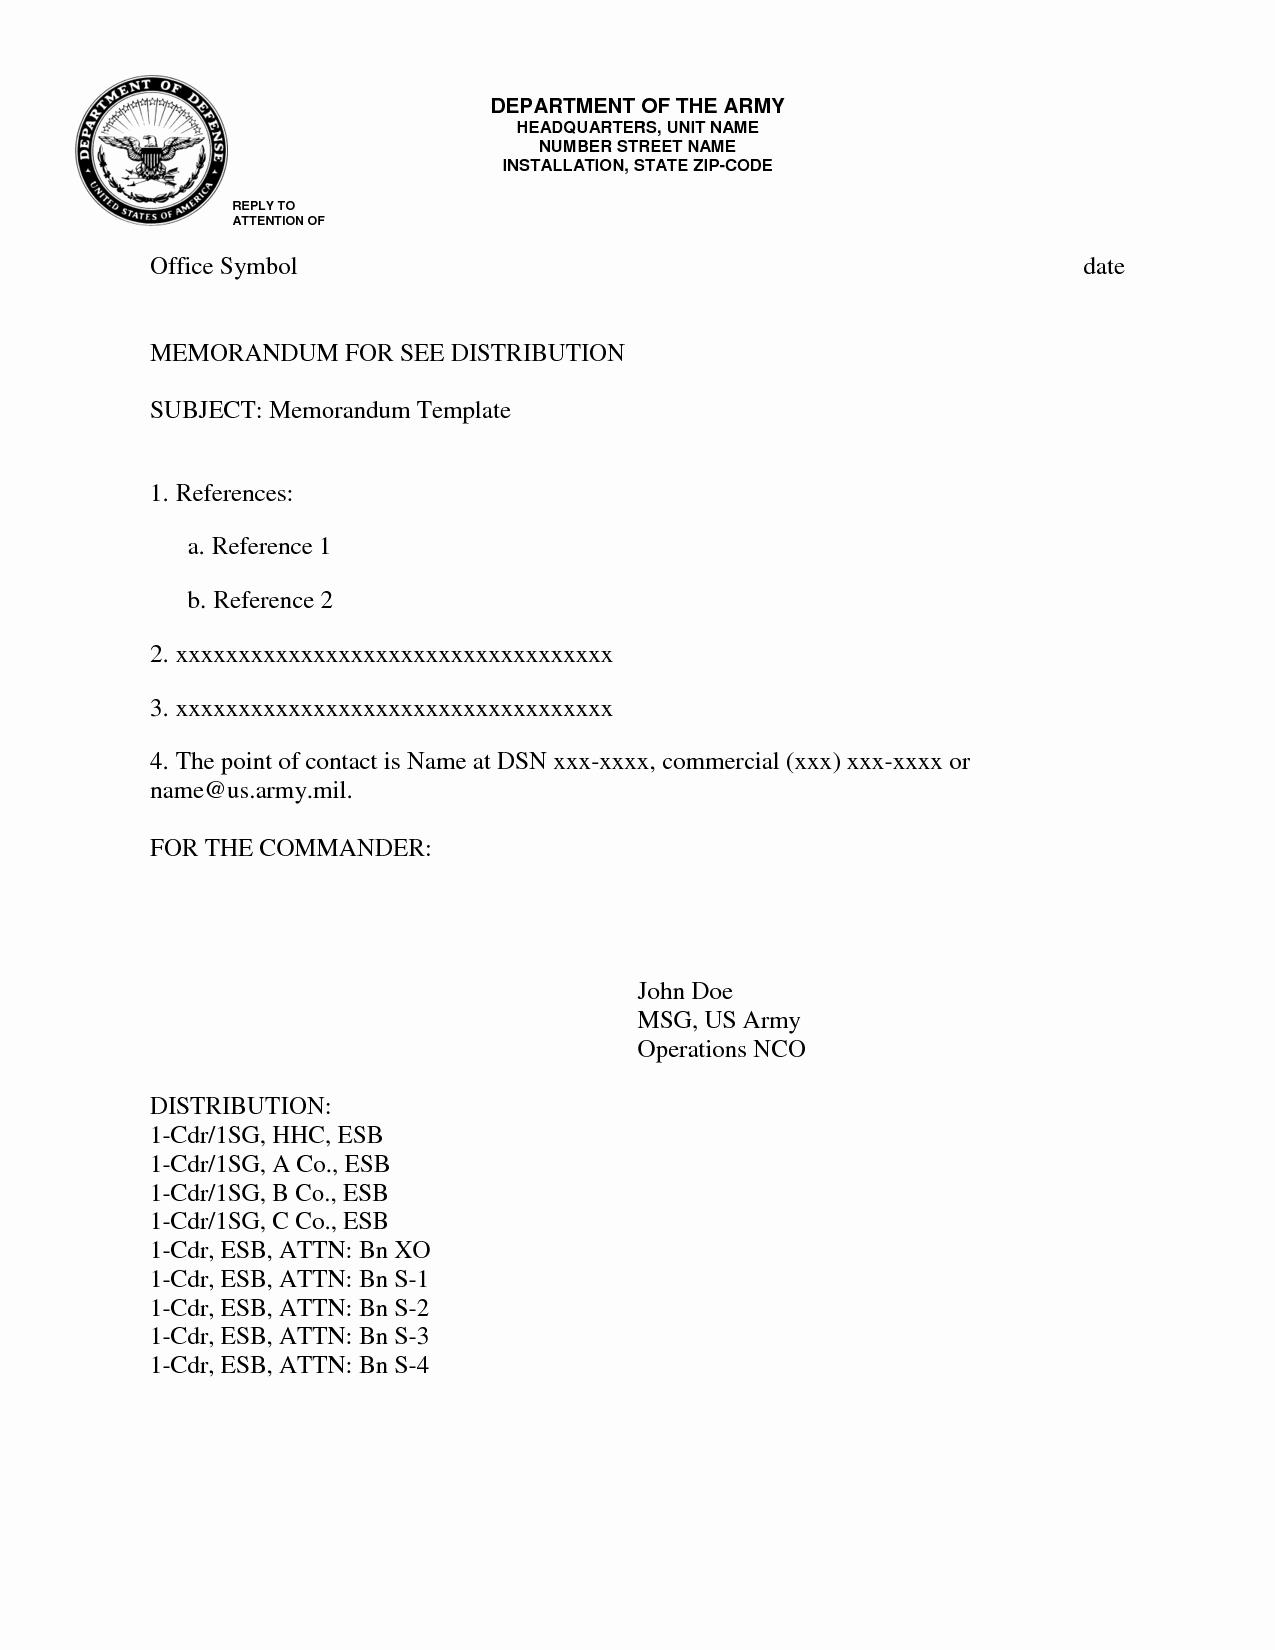 Army Memorandum Template